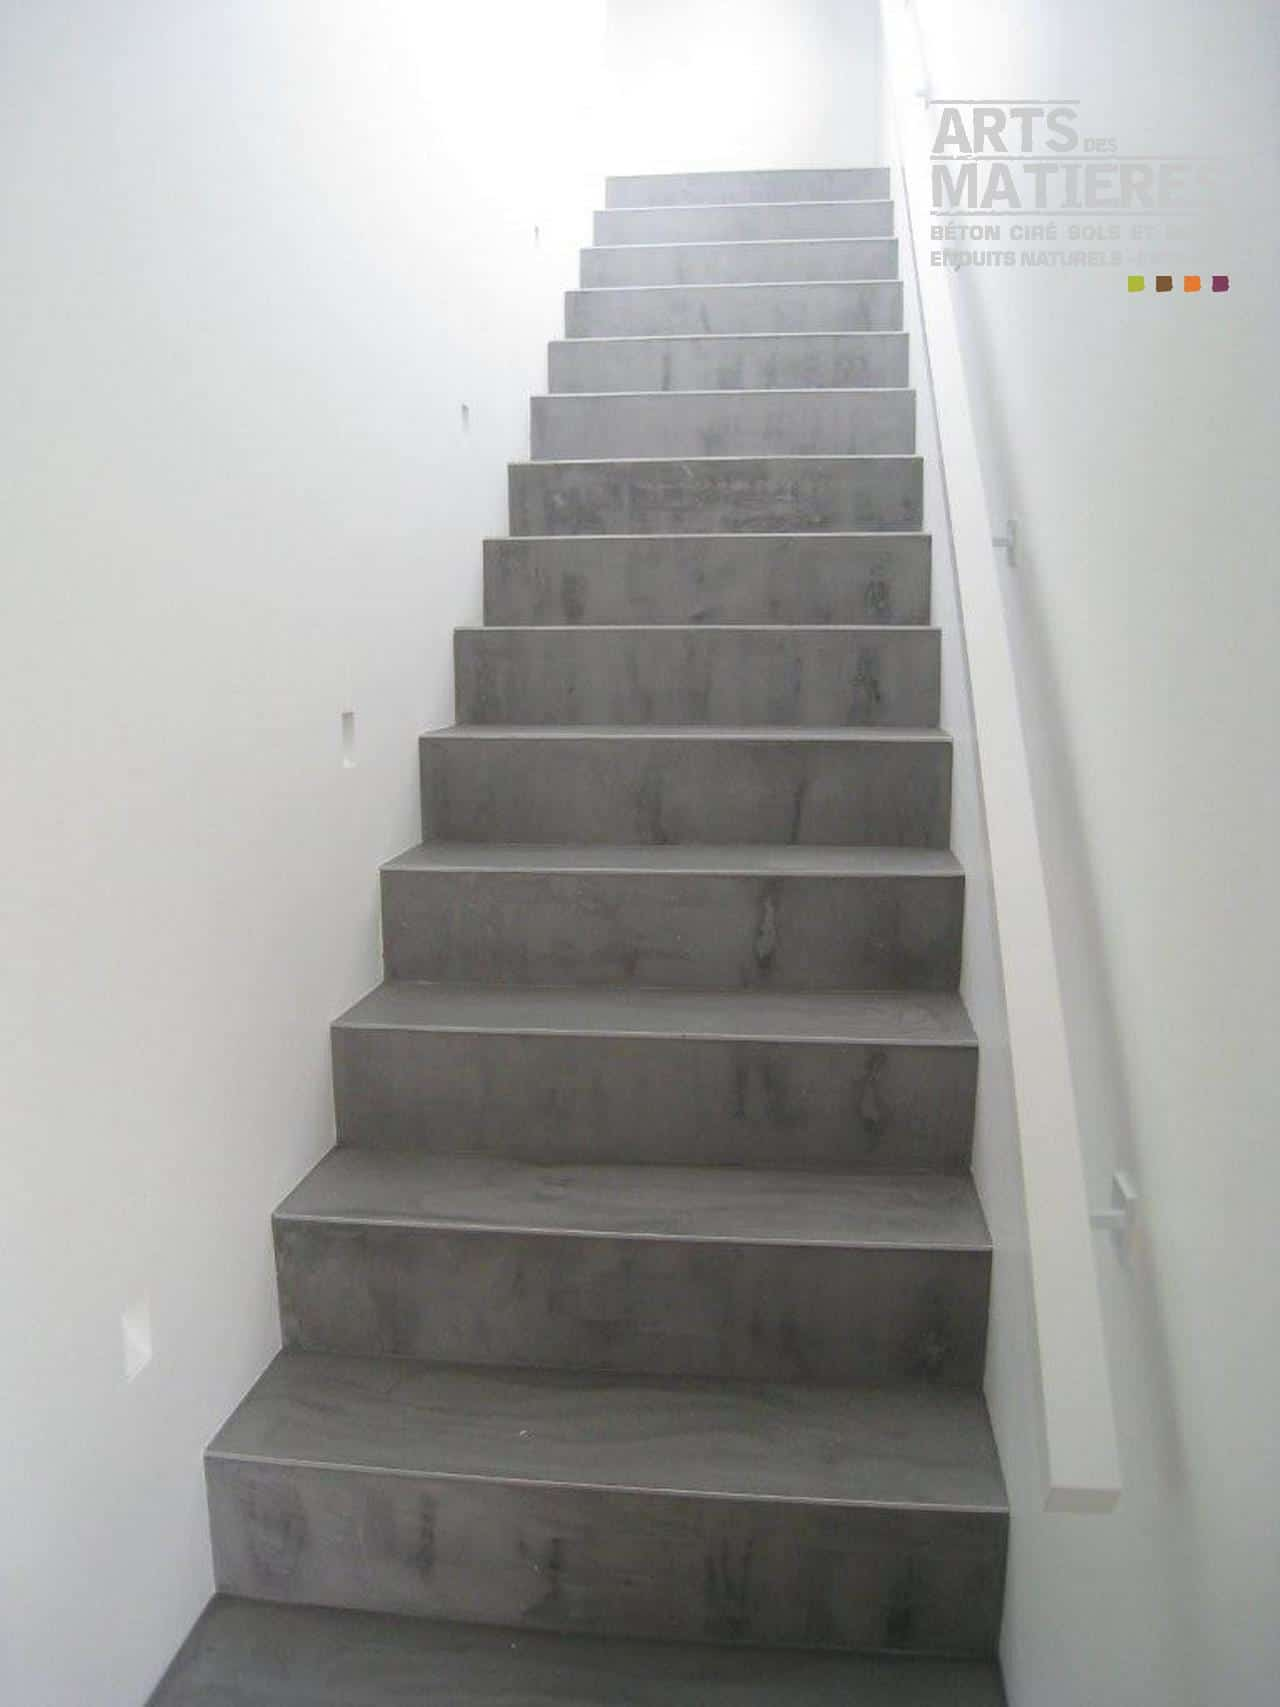 Recouvrir Un Escalier En Béton escalier en béton ciré | béton ciré & enduits décoratifs